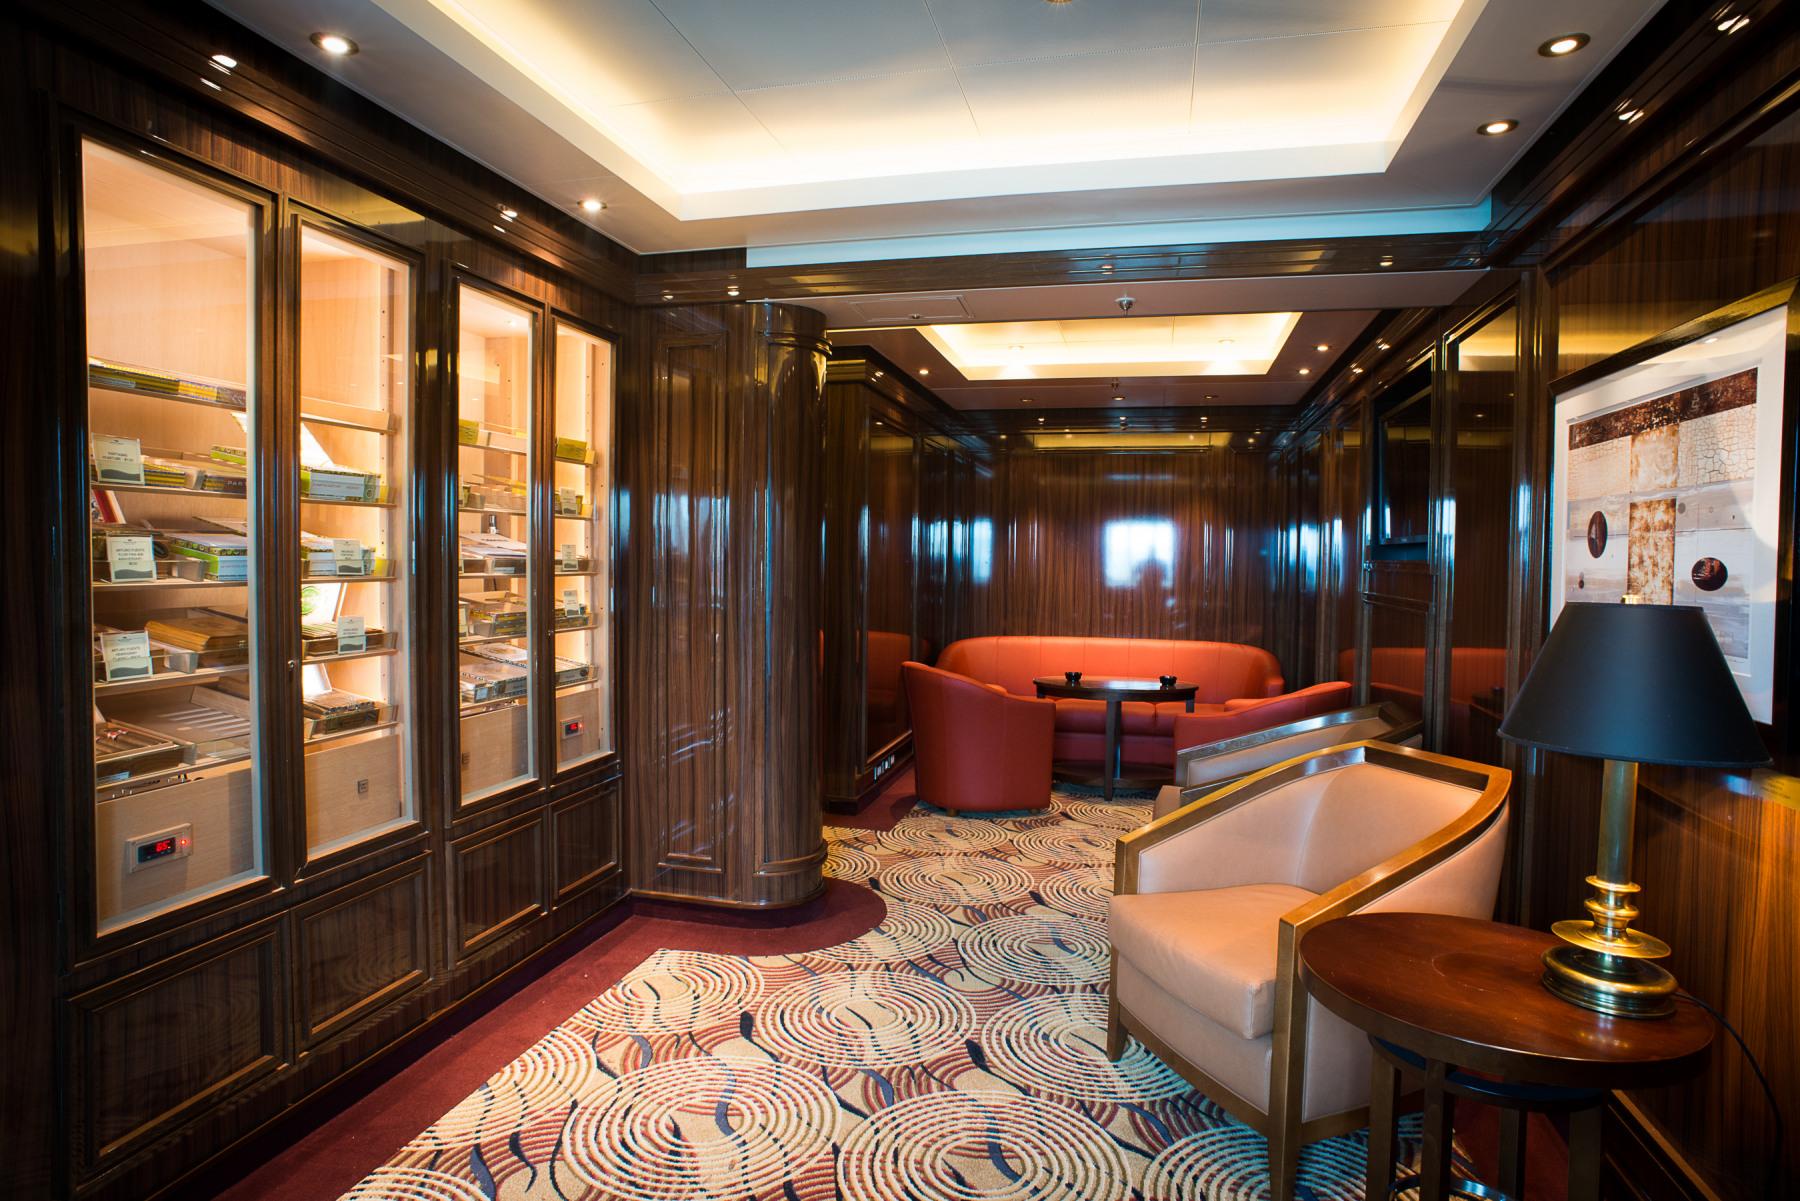 Princess Cruises Coral Class Interior cigar room.jpg